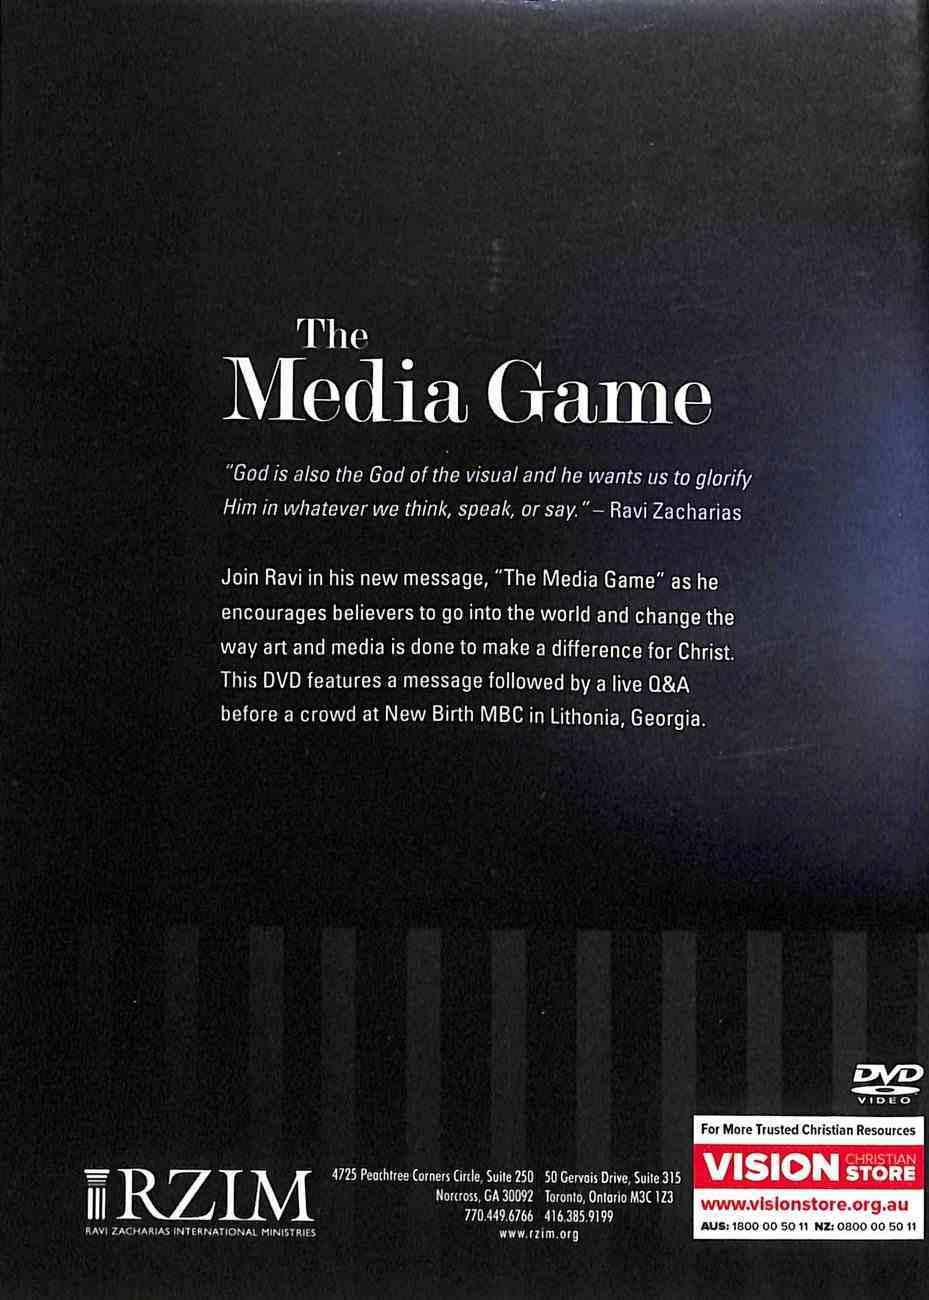 The Media Game DVD